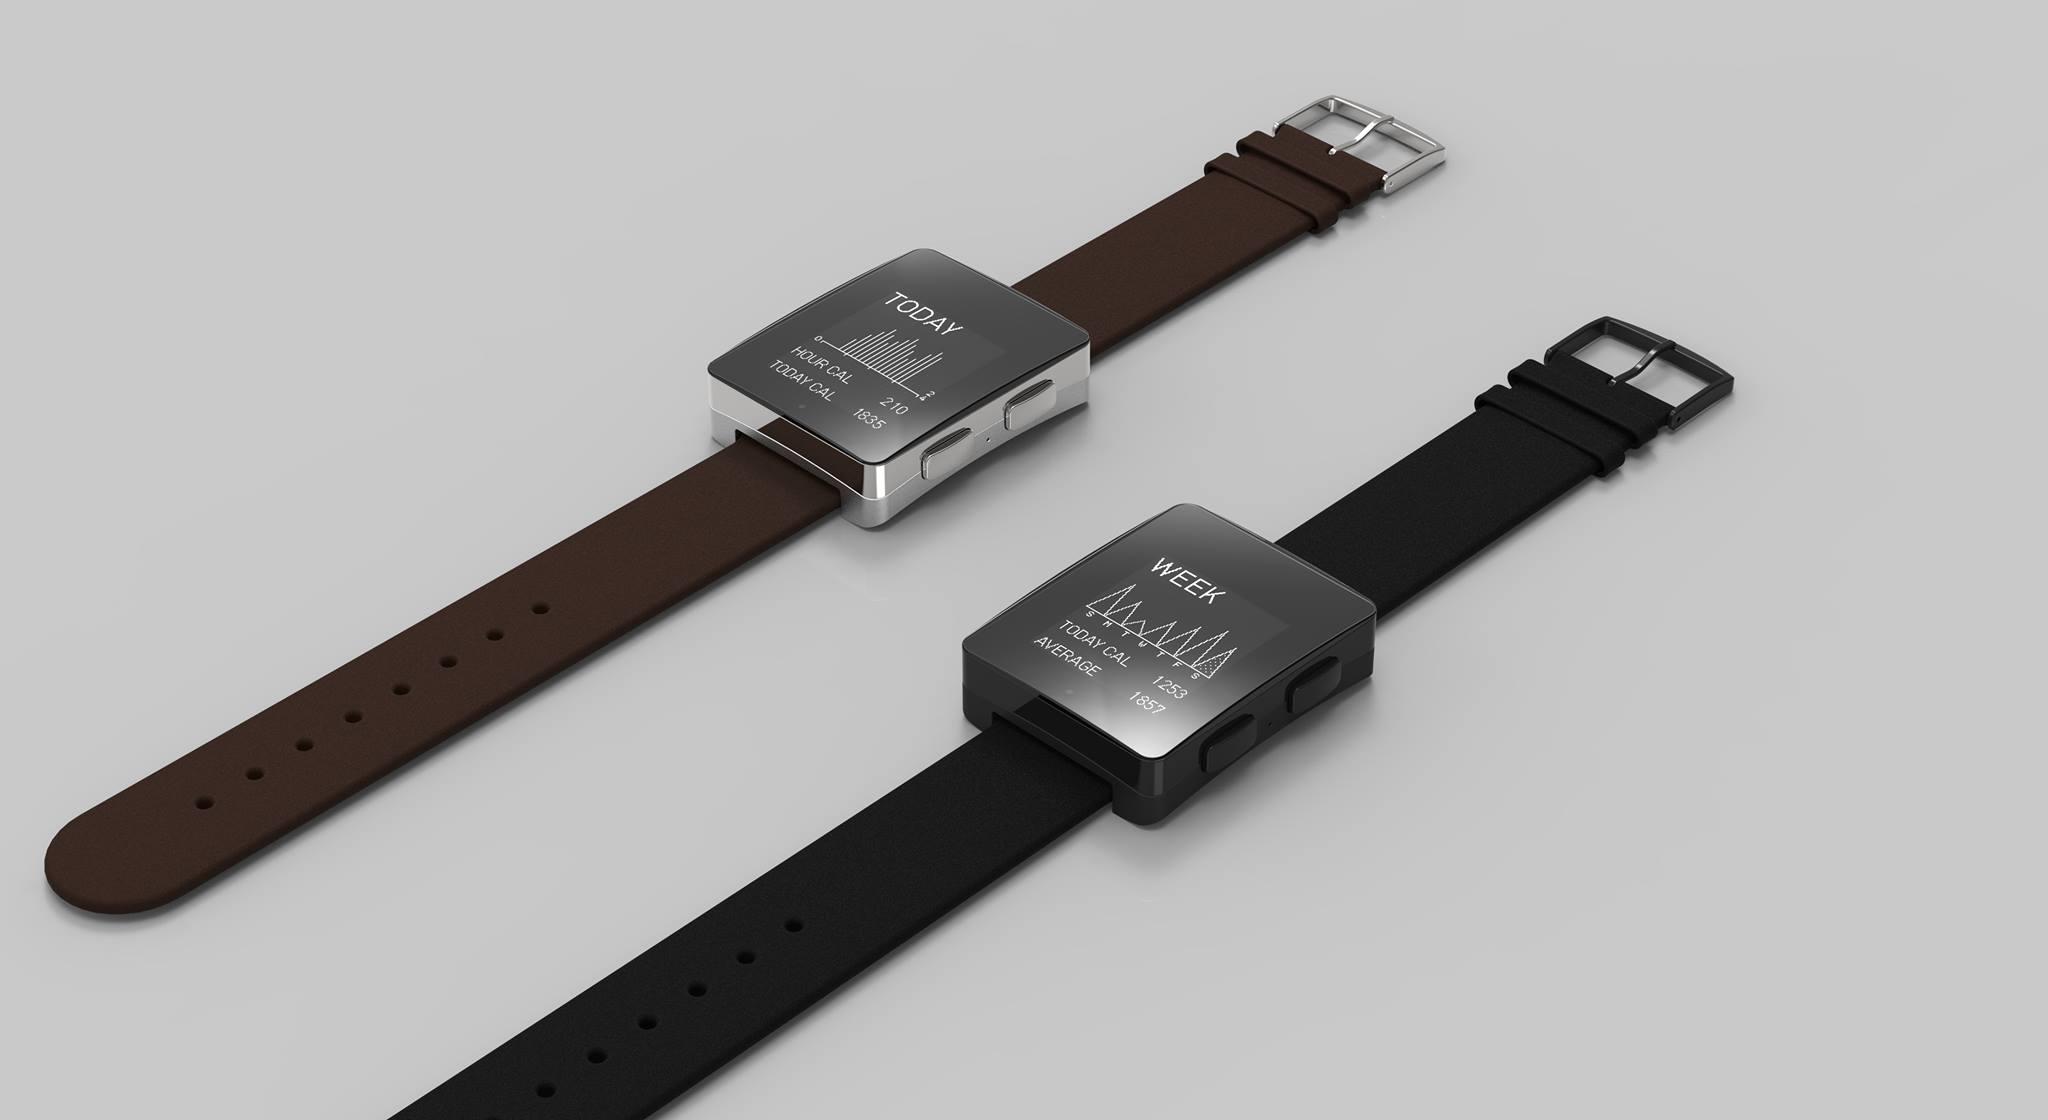 Welograph Fitness Tracker Smartwatch